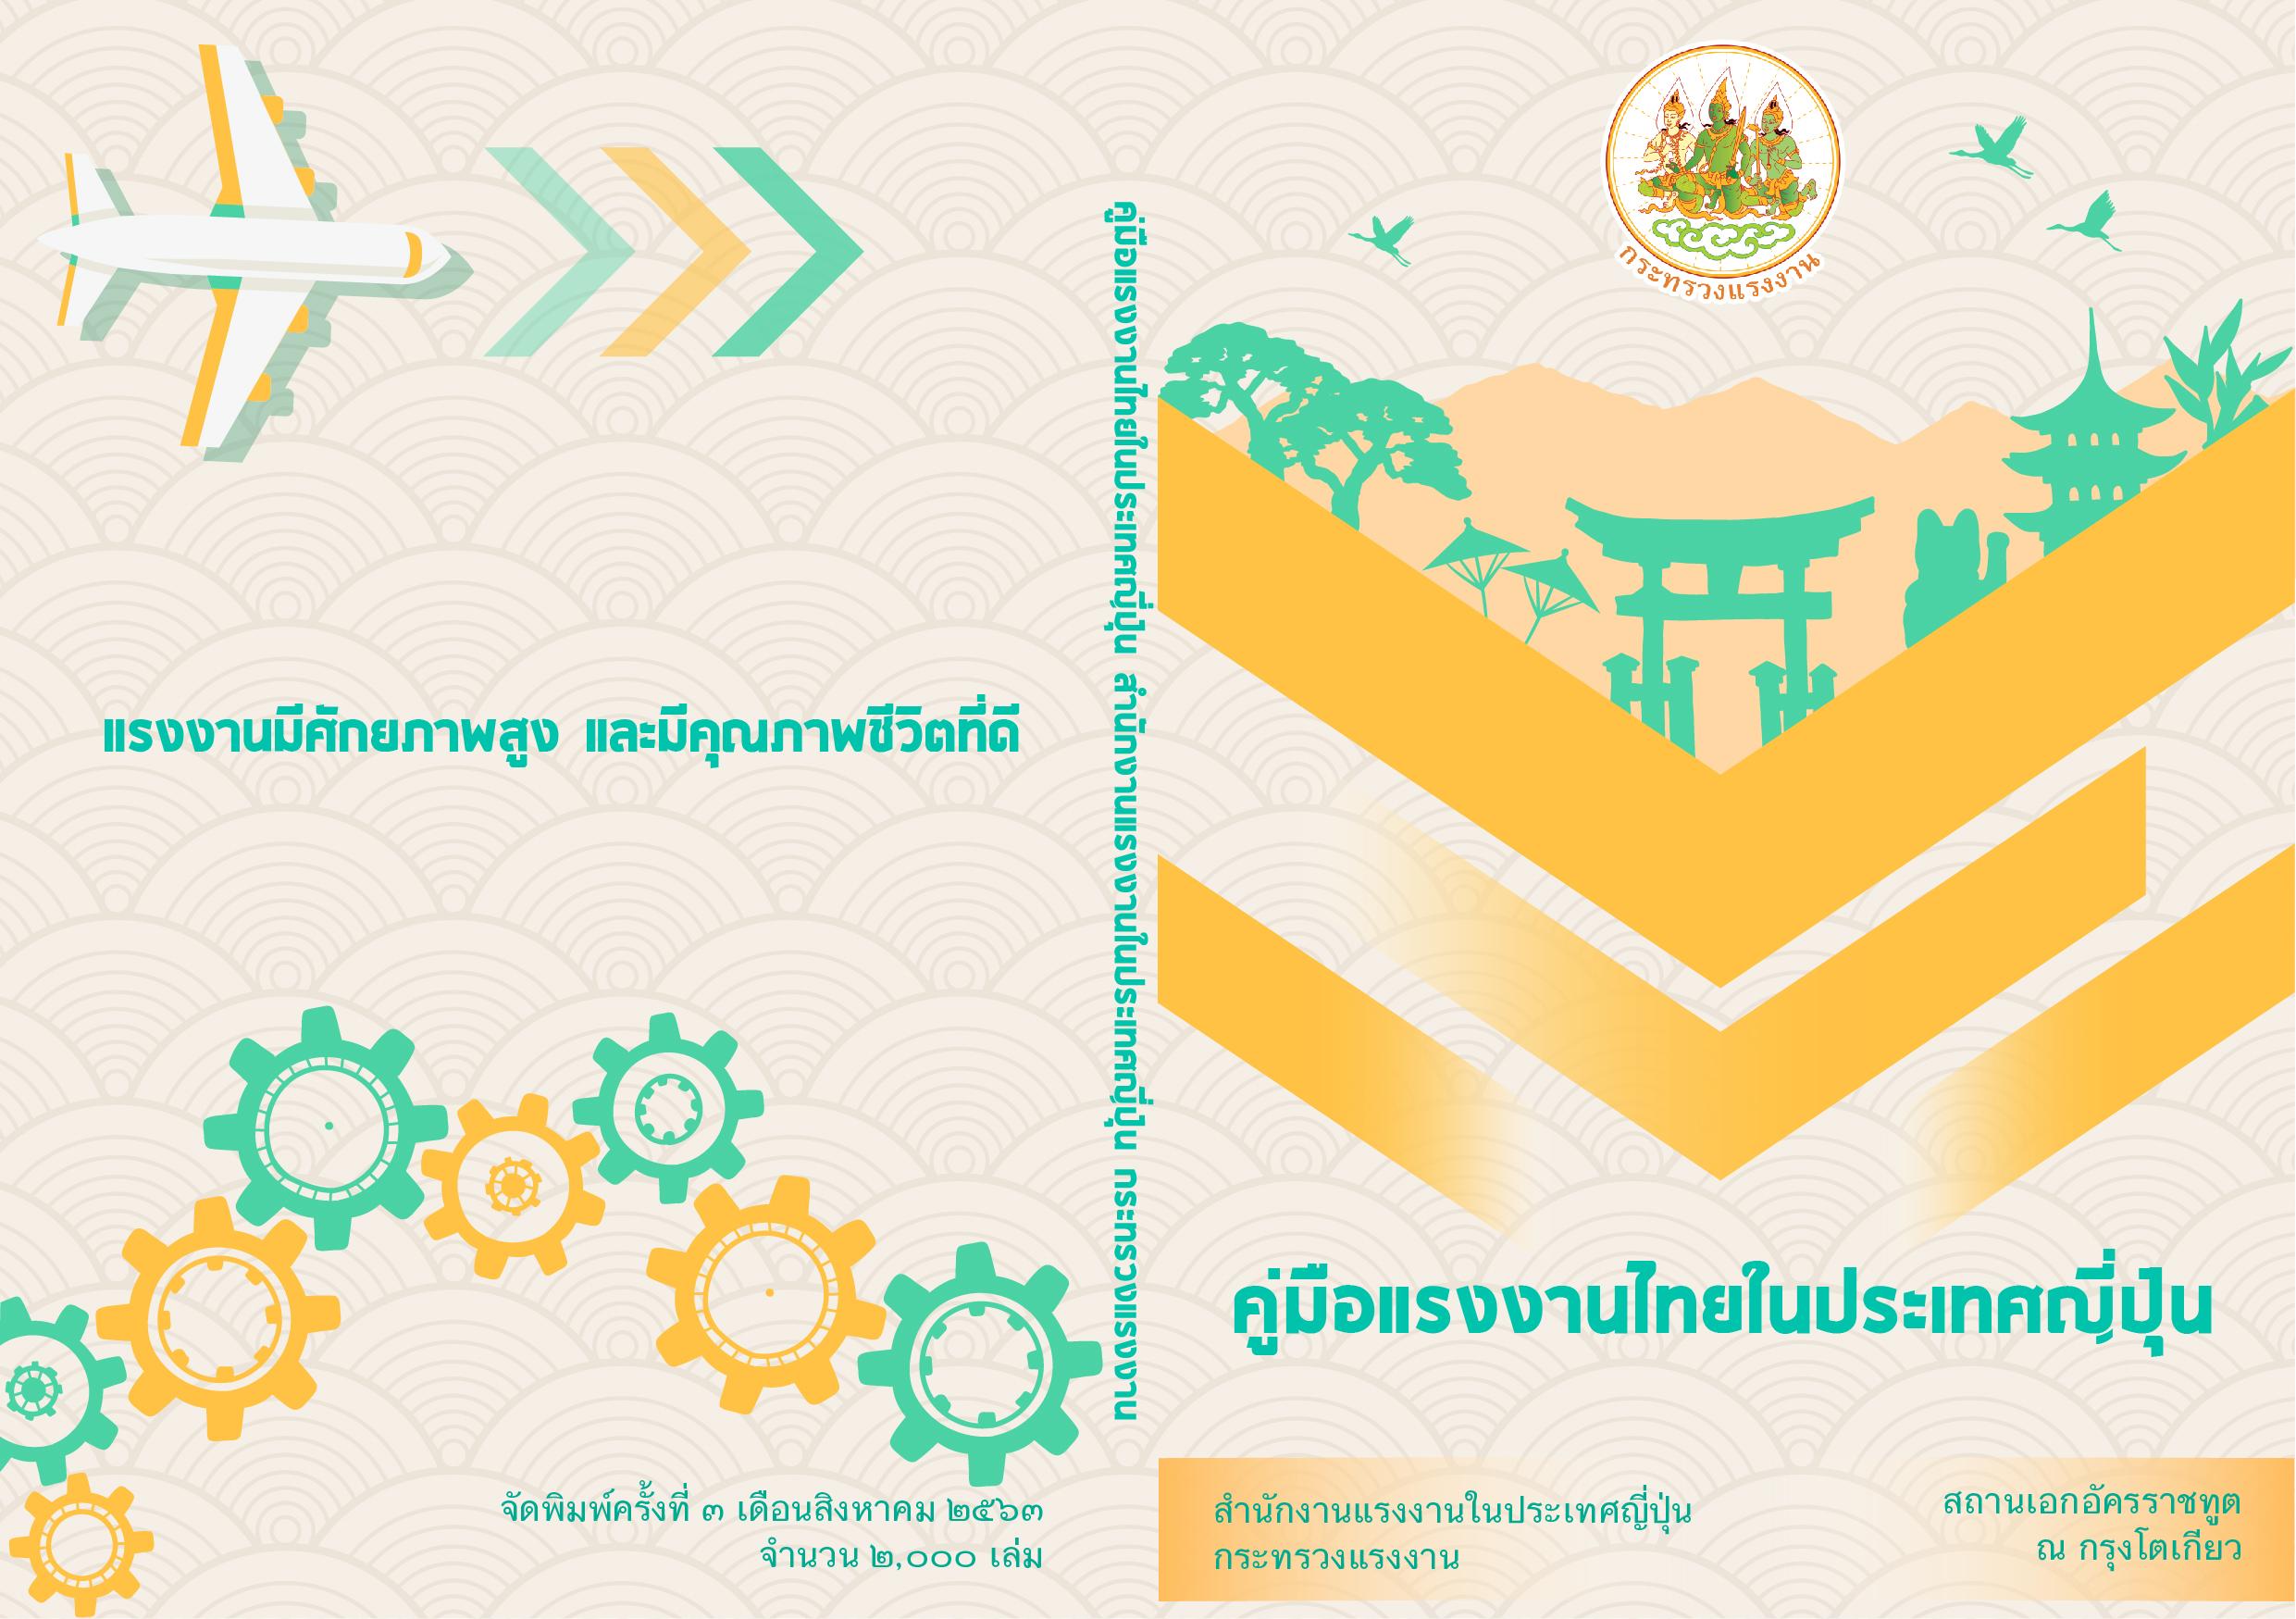 Coverpage_คู่มือแรงงานไทยในประเทศญี่ปุ่น